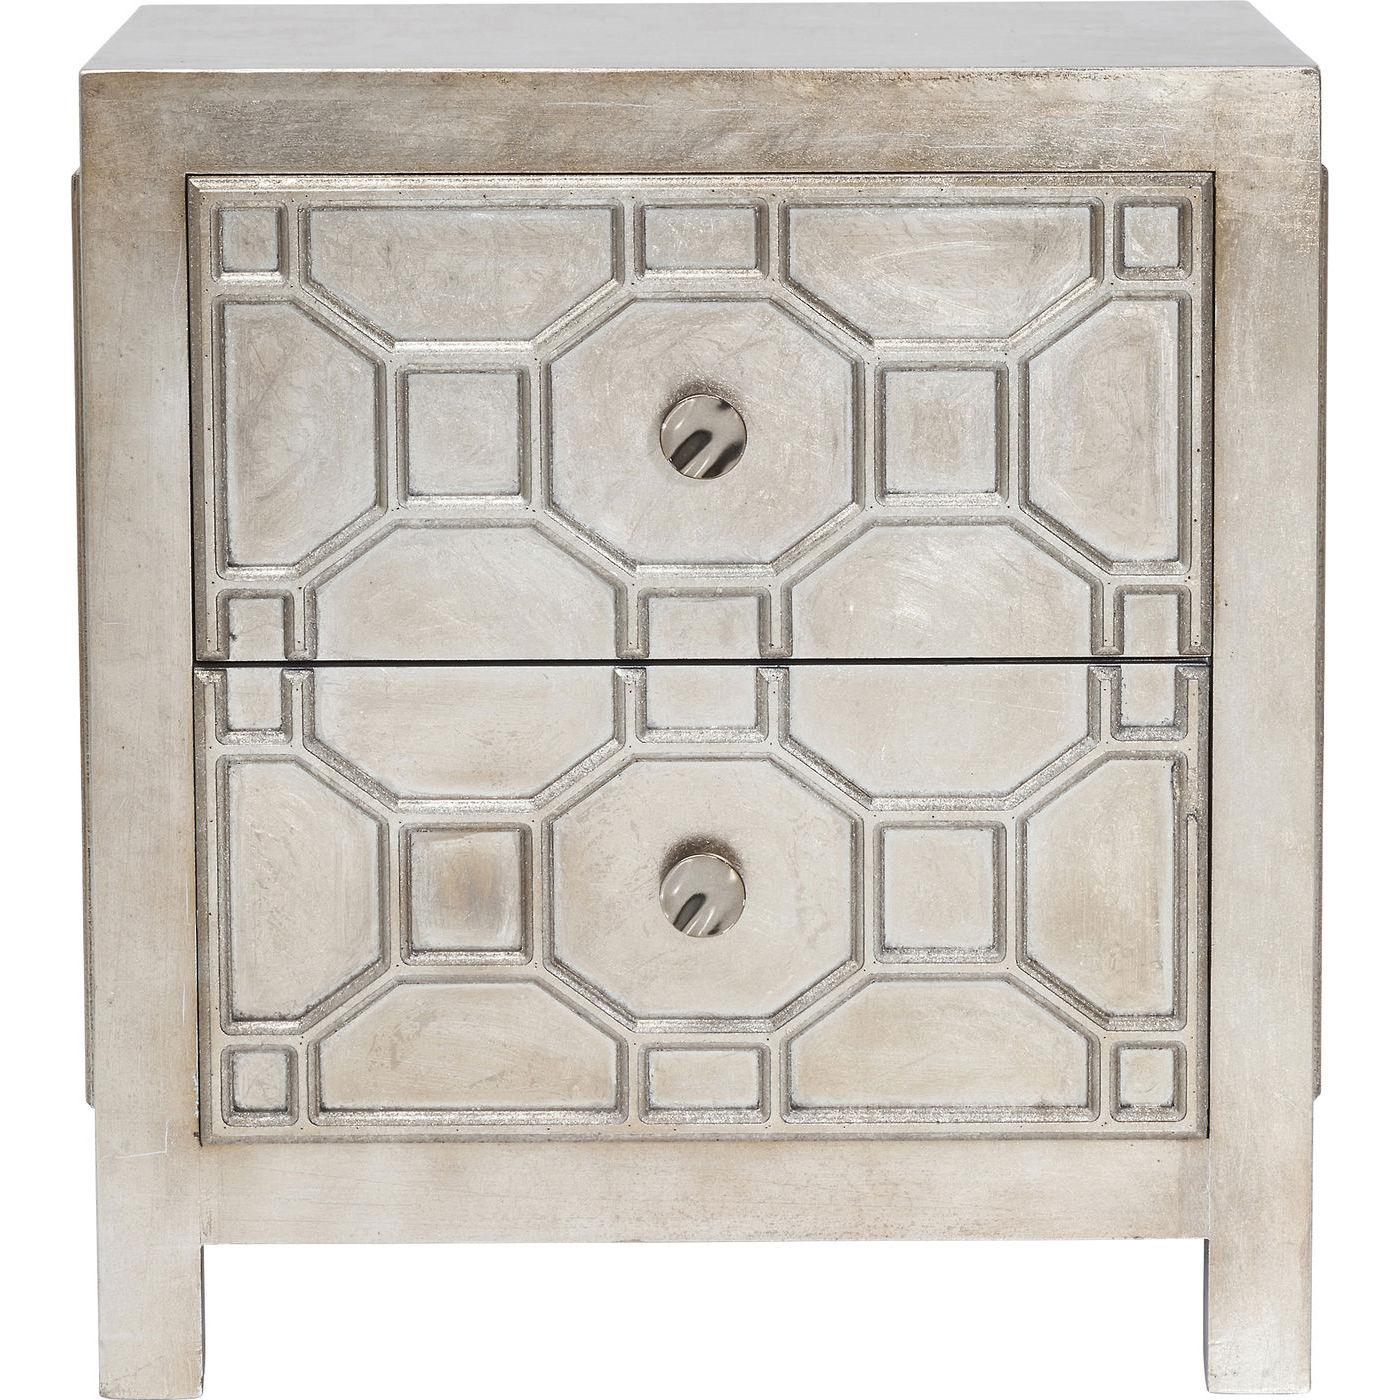 Image of   Kare Design Alhambra Natbord m. 2 skuffer